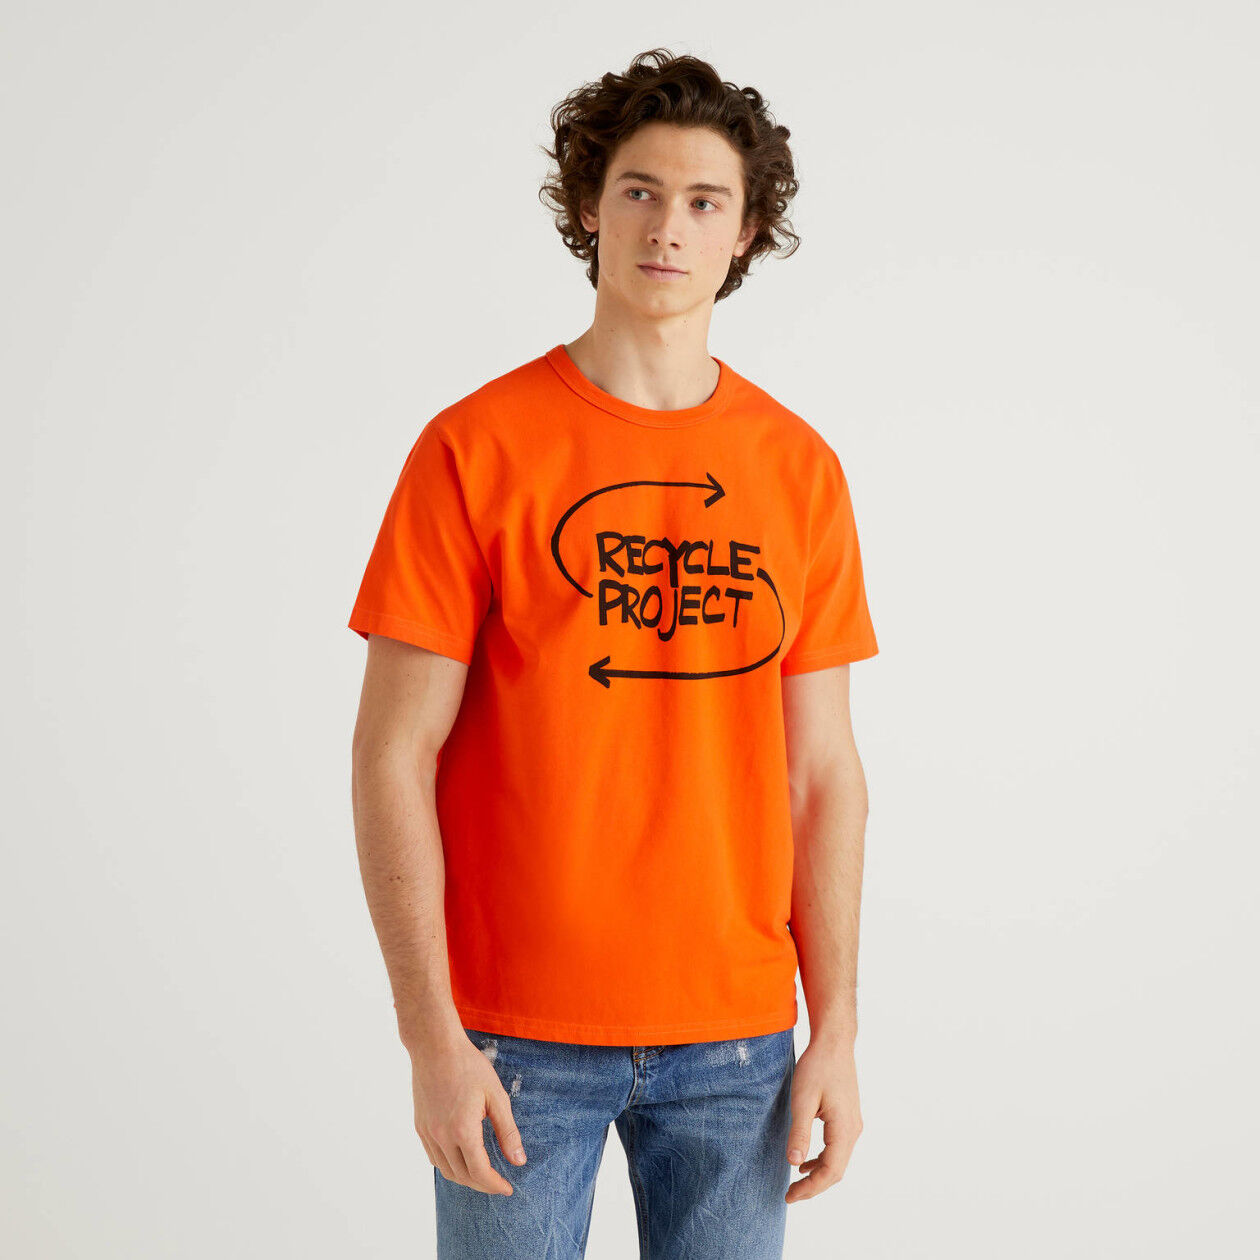 T-shirt από 100% οργανικό βαμβακερό με τύπωμα